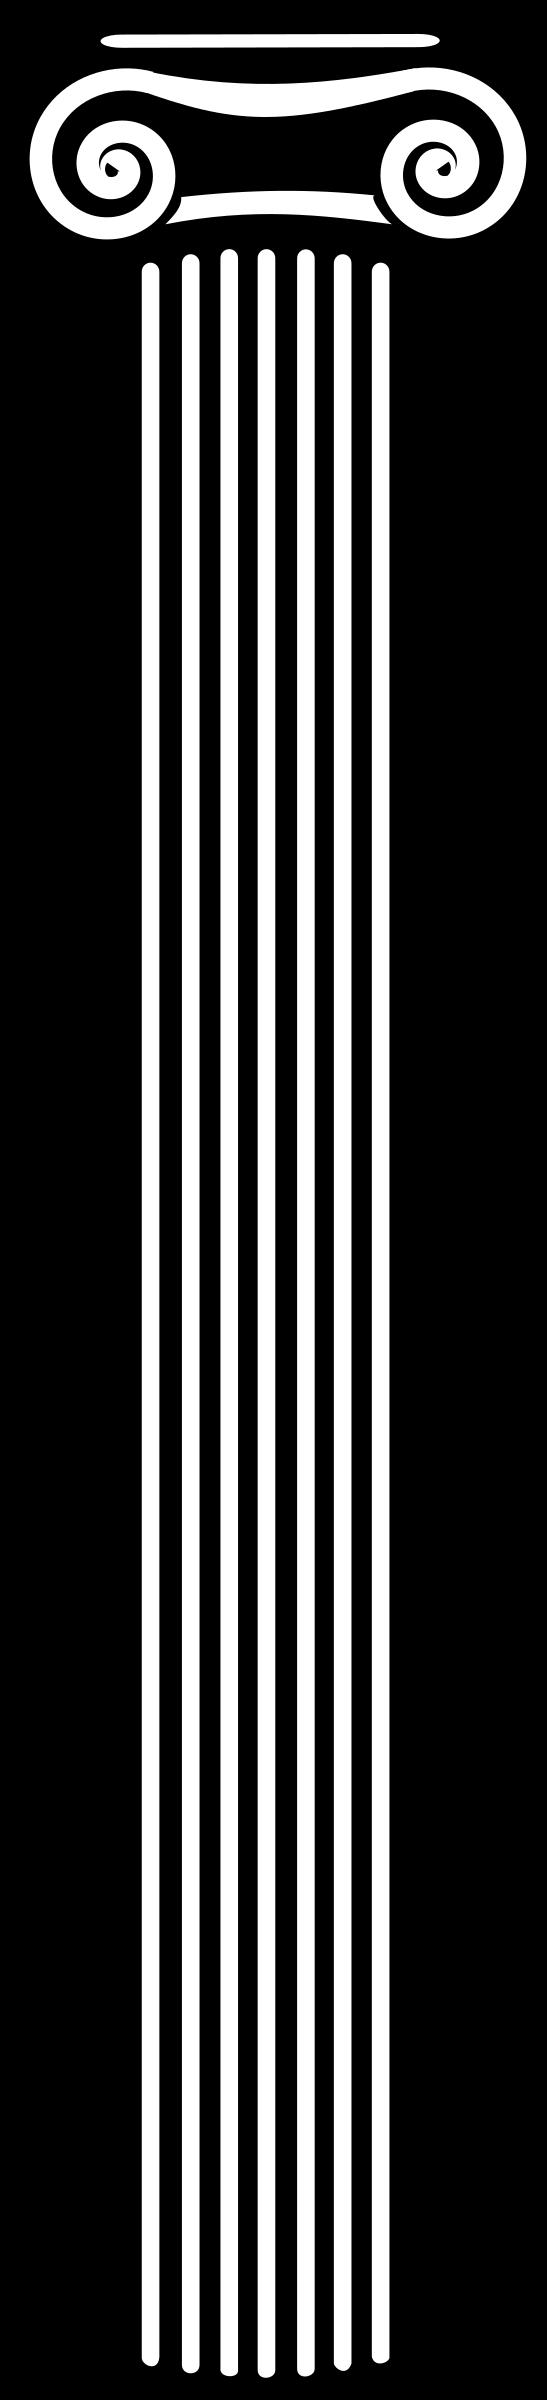 Clipart - Column - 26.6KB